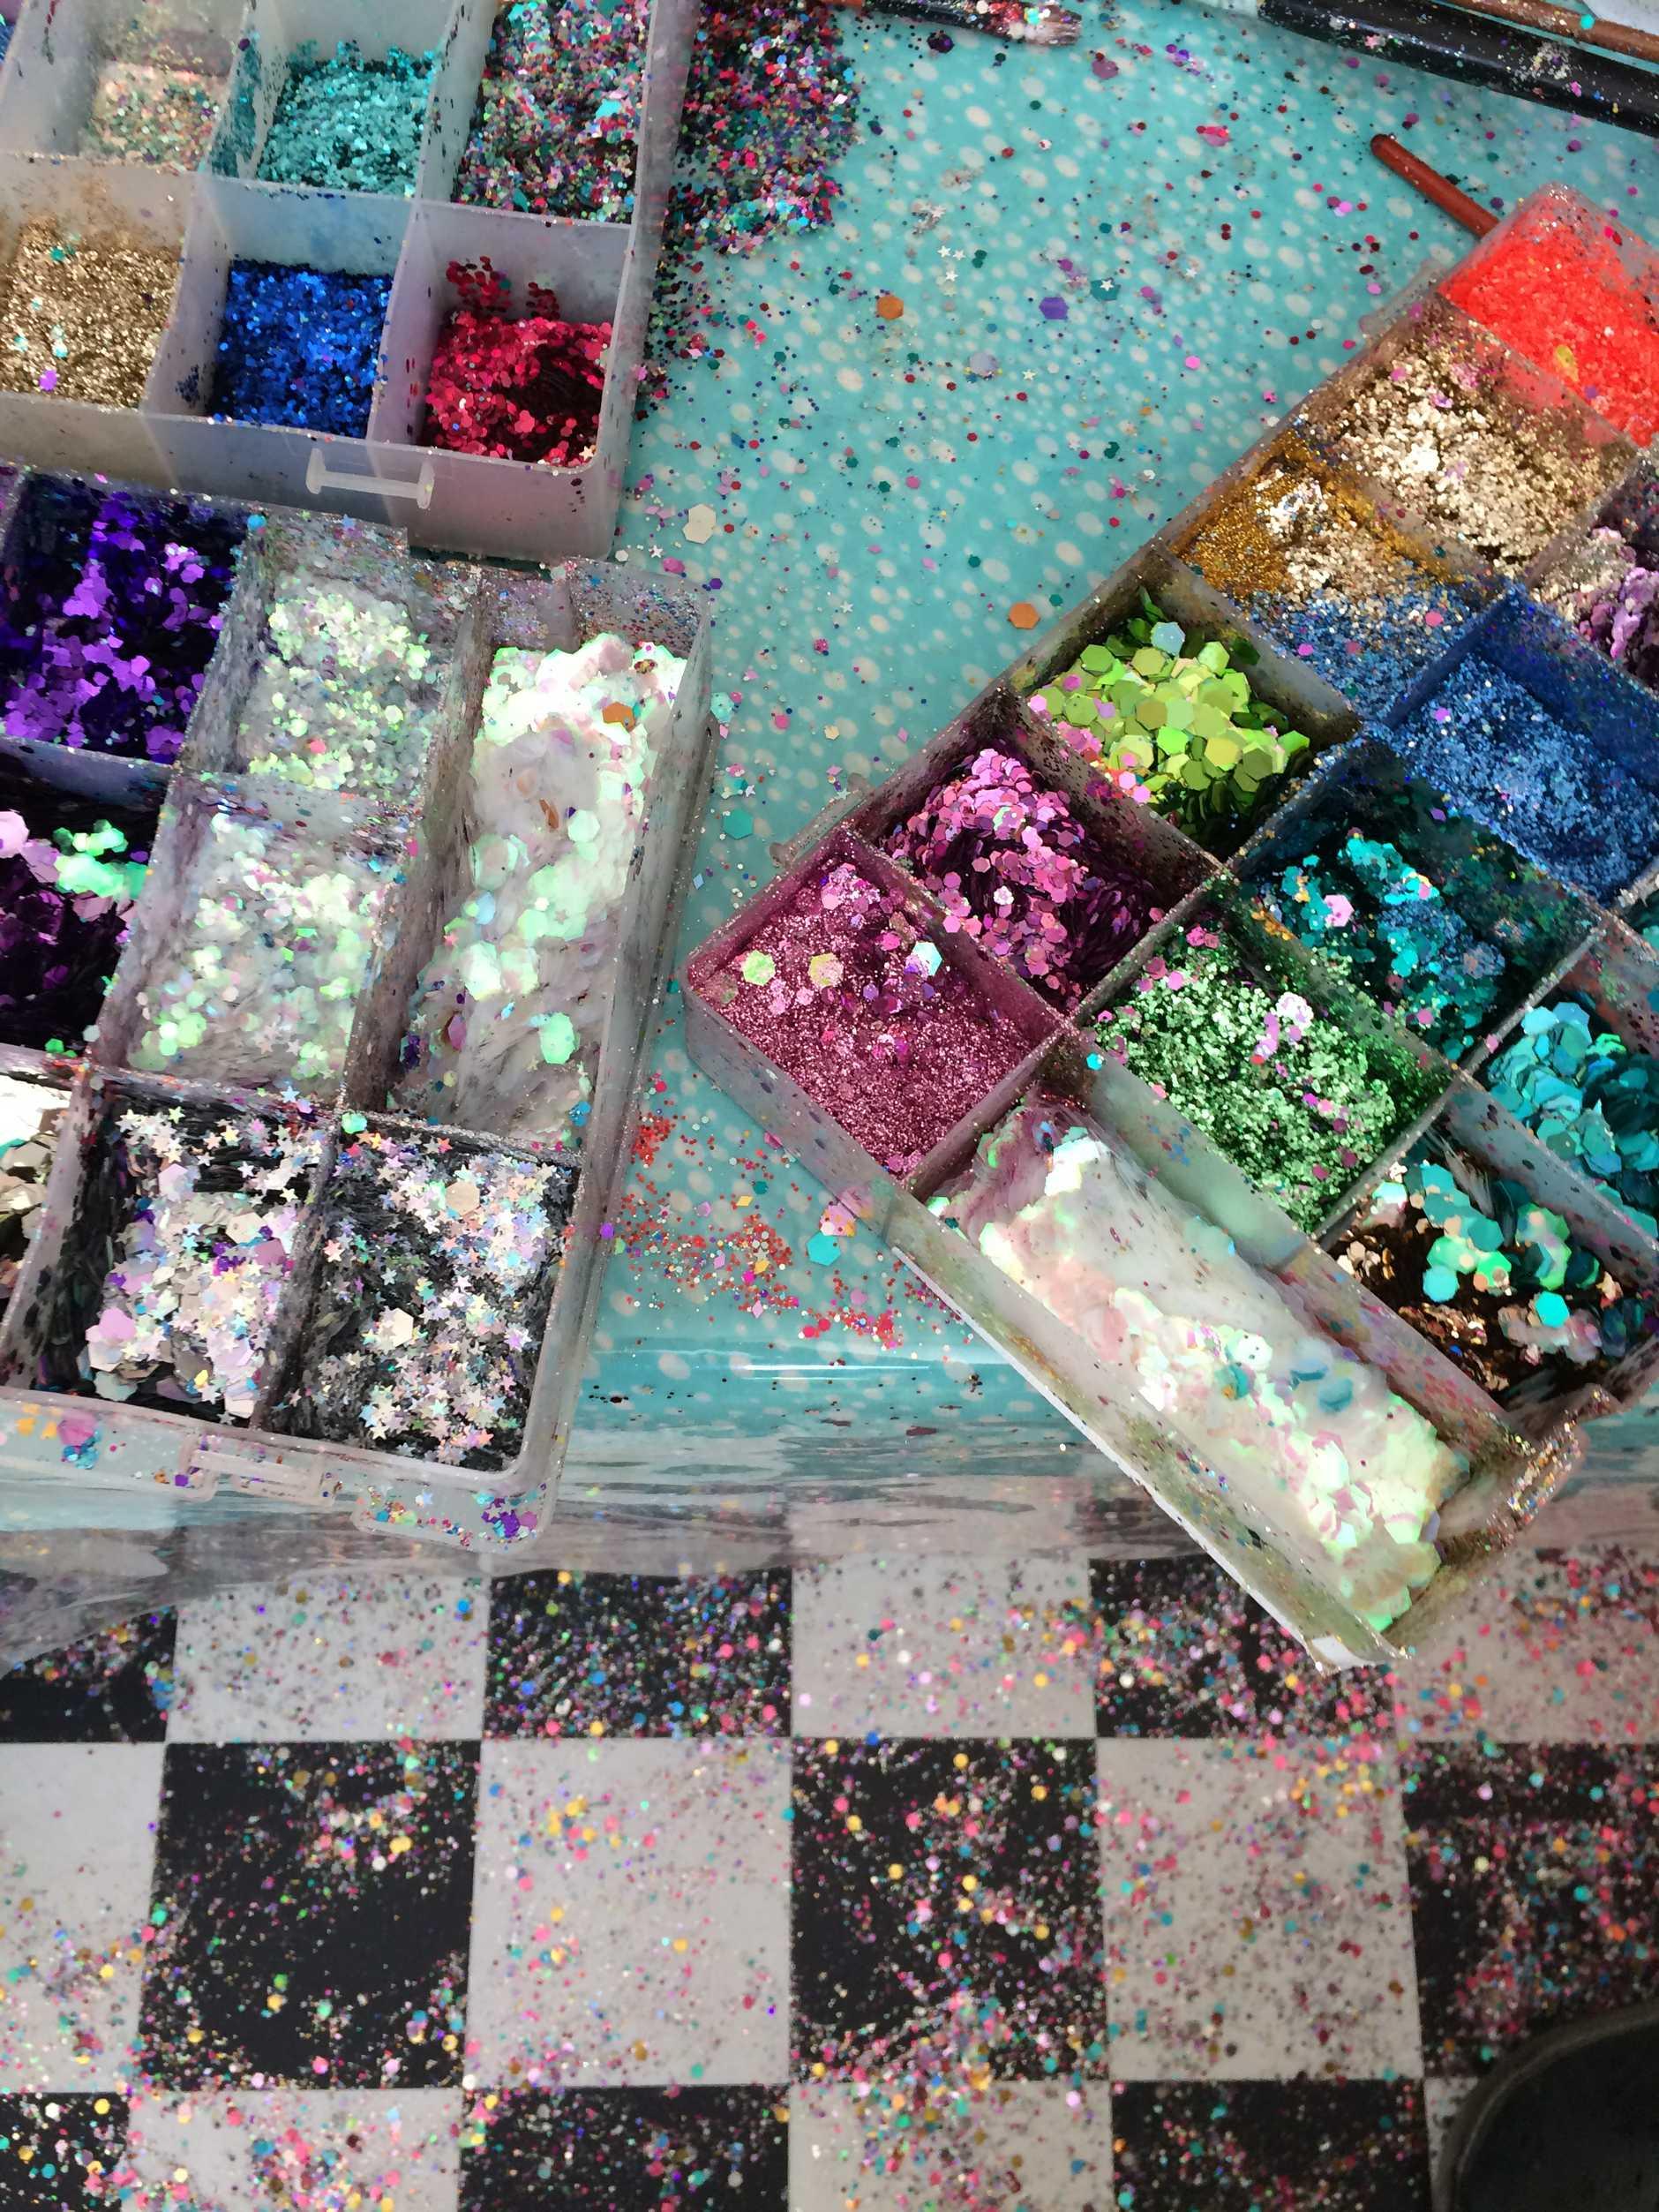 Glitoris glitter.